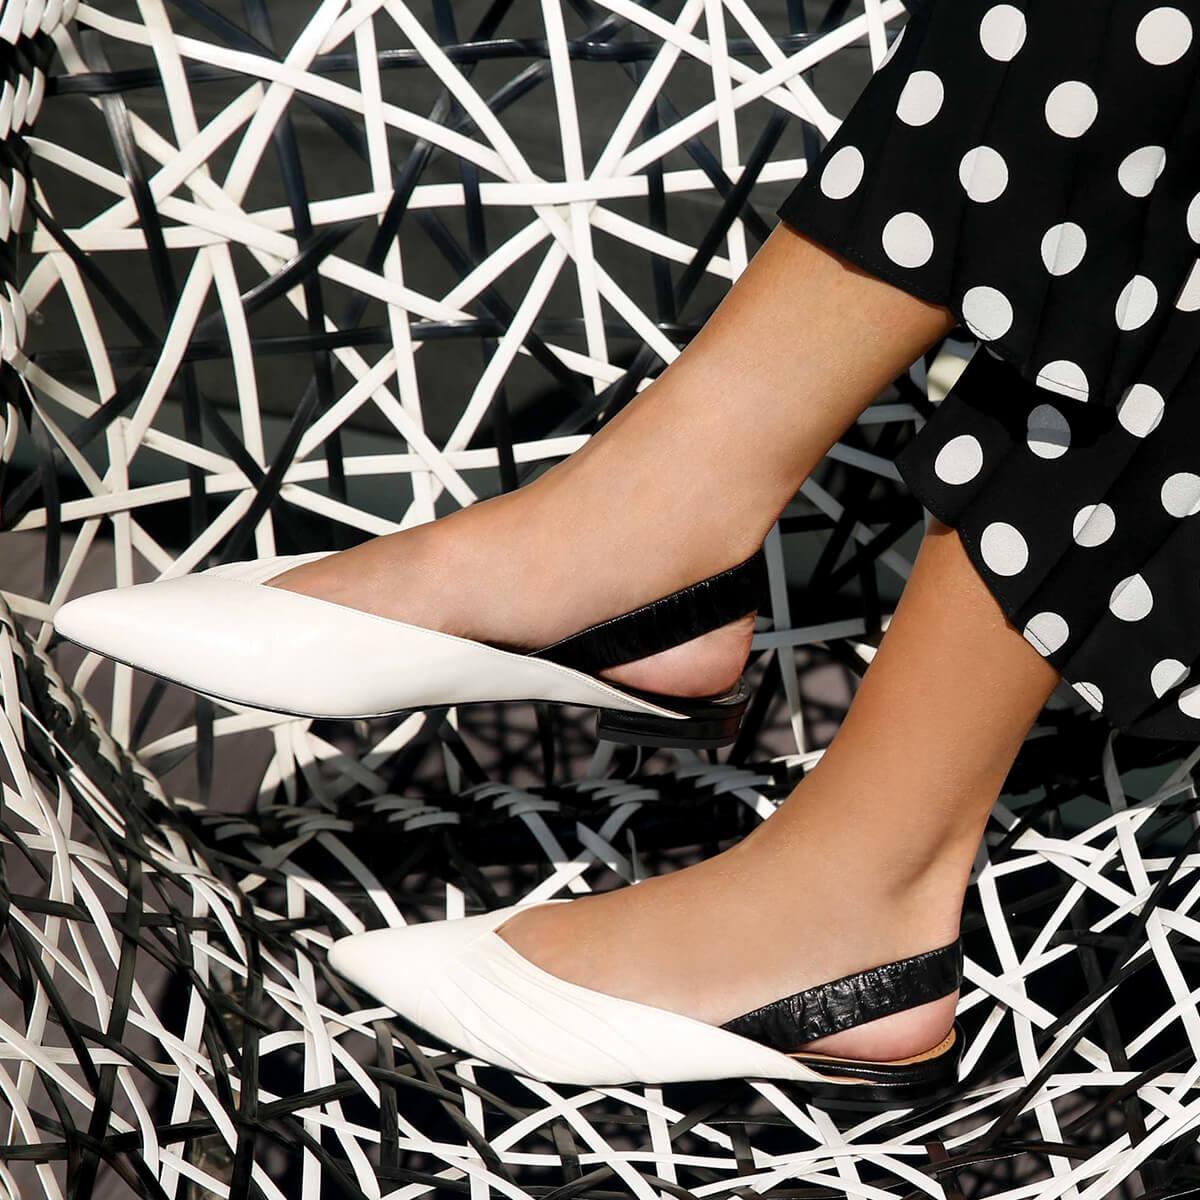 8b842e4d1ac Slingback point-toe flats in white and black leather. Oneka Pura López